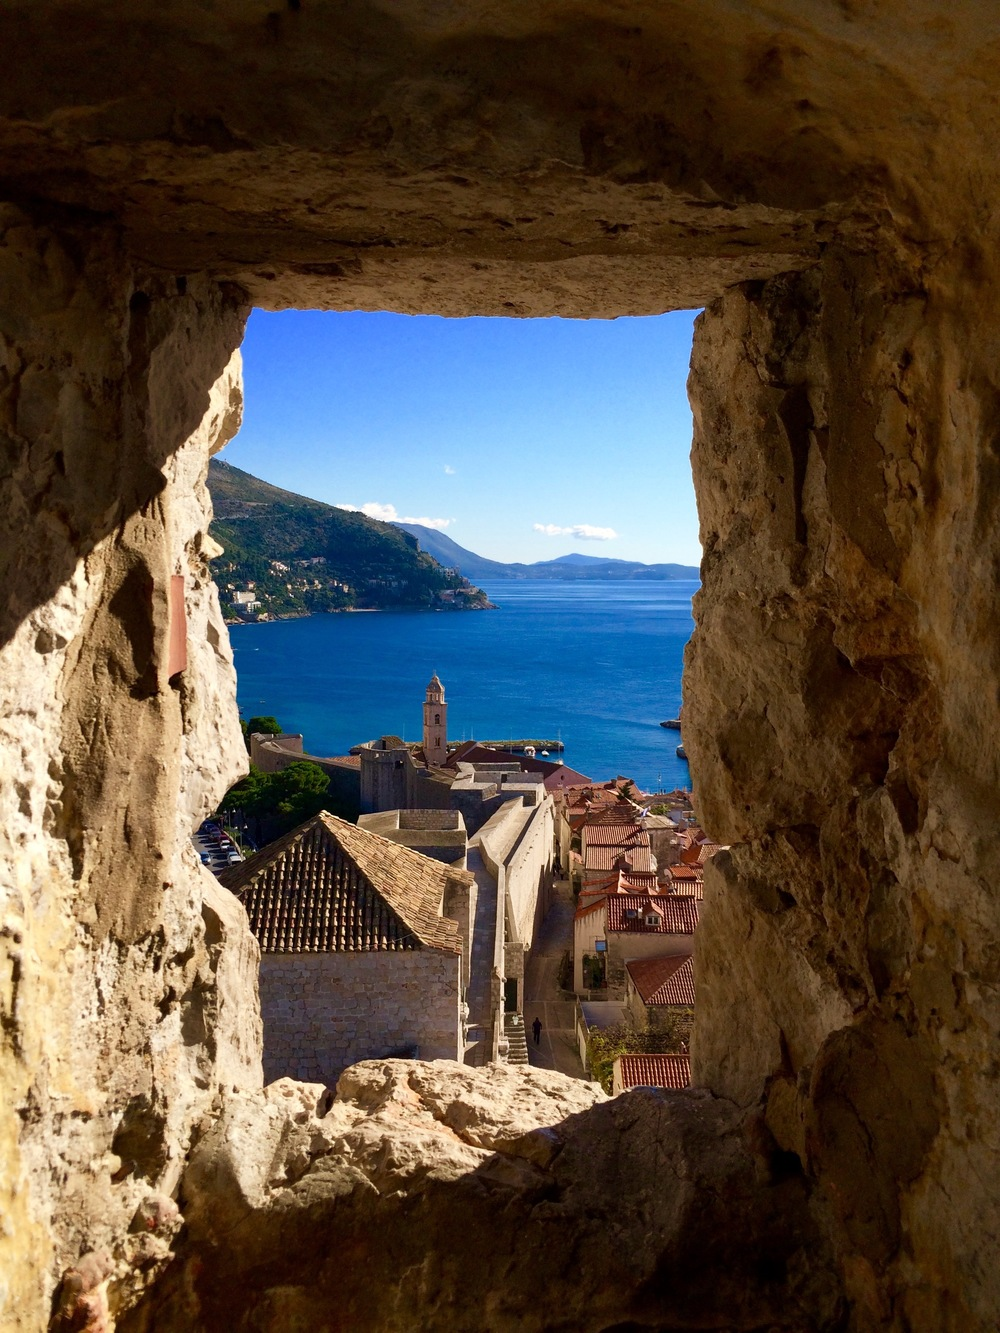 A glimpse at the beauty of Dubrovnik, Croatia. Photo: Larisa Graham.